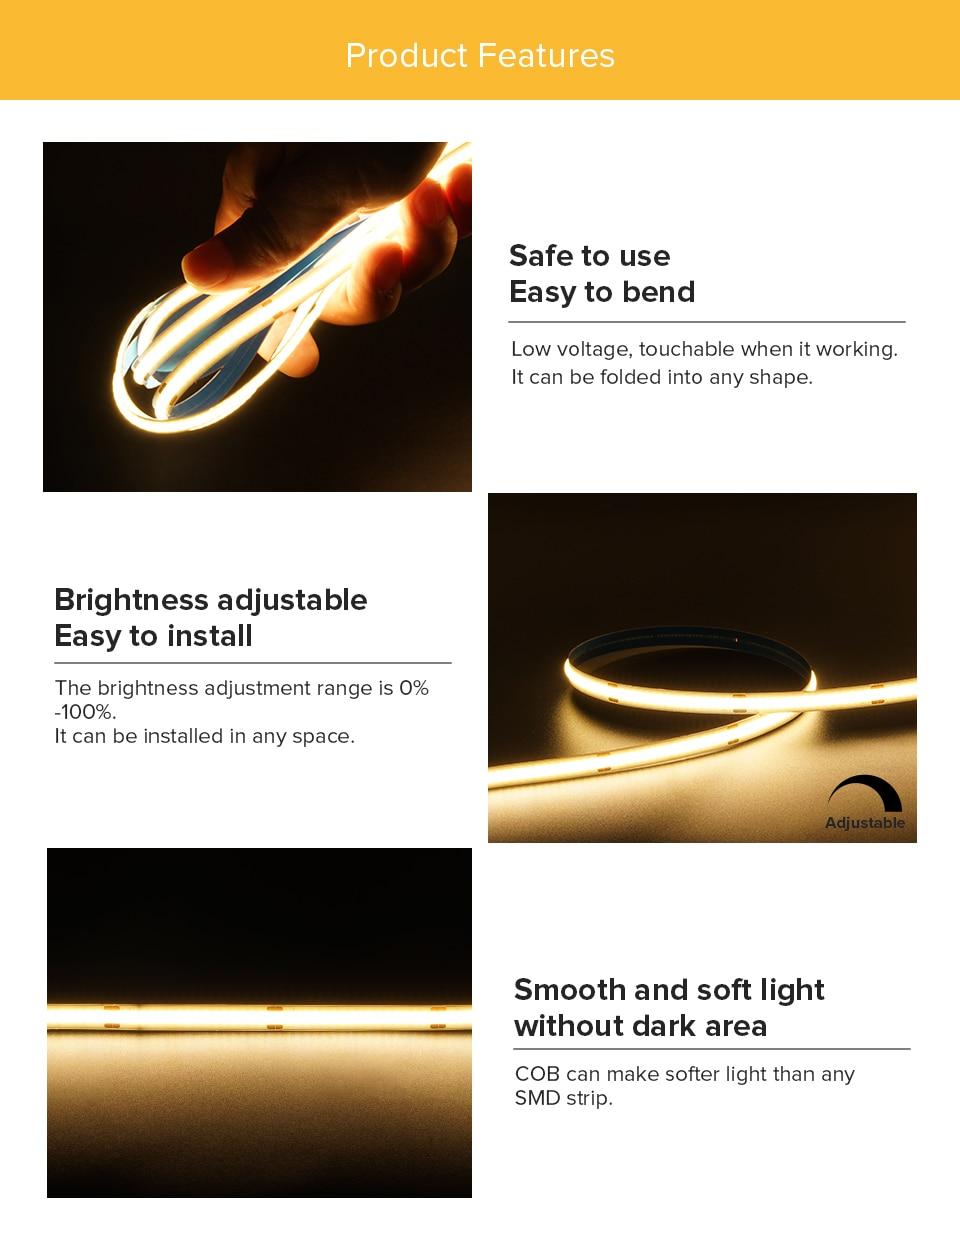 FCOB LED Strip Light 360 480 LEDs High Density Flexible FOB COB Led Lights RA90 Warm Nature Cool White Linear Dimmable DC12V 24V